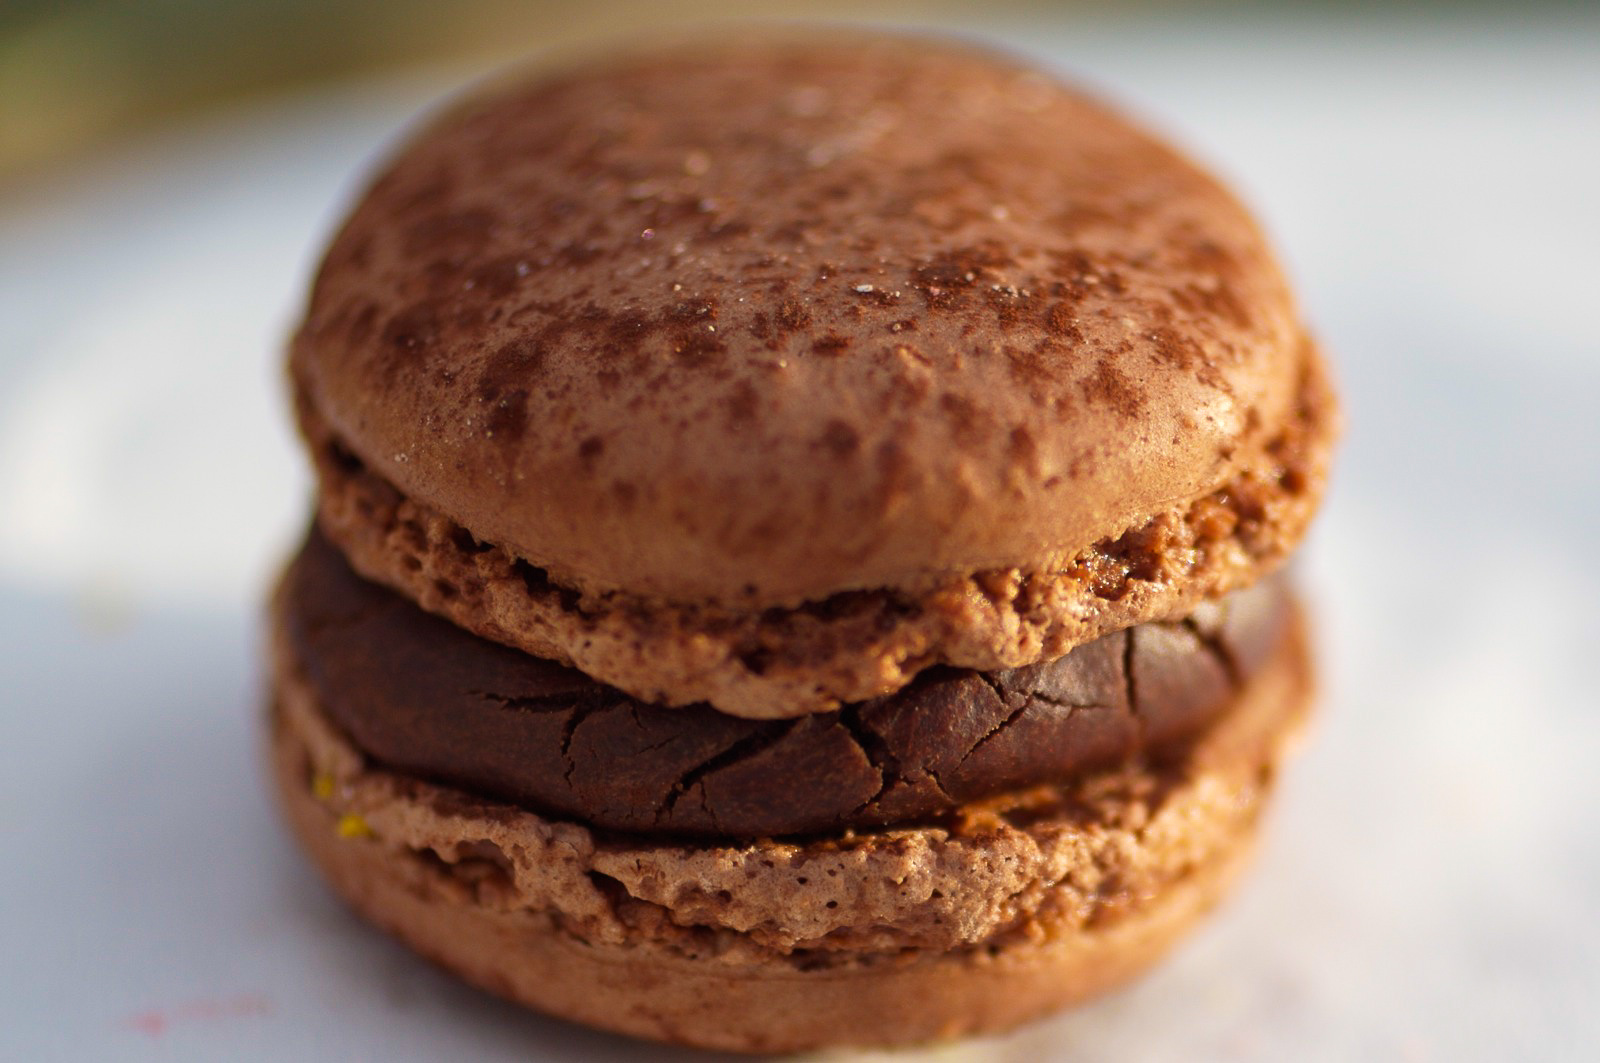 Chocolat - biscuit macaron chocolat, ganache au chocolat amer